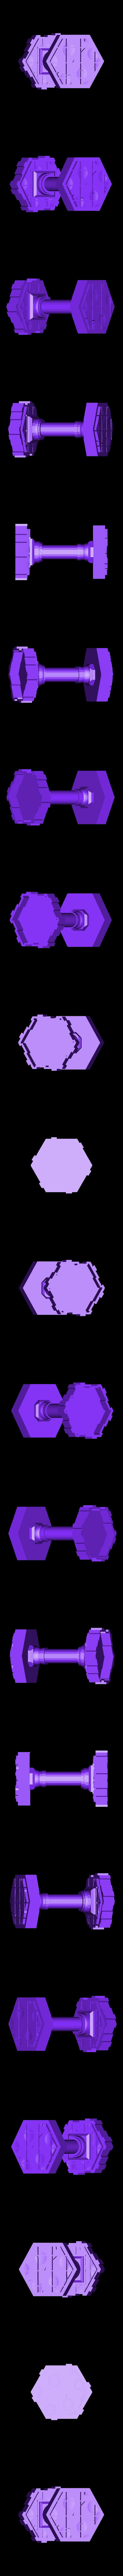 Hex_Tall_Pillar_and_Top_Together.stl Download free STL file Locking Hex Stone Pillars • 3D printable design, mrhers2